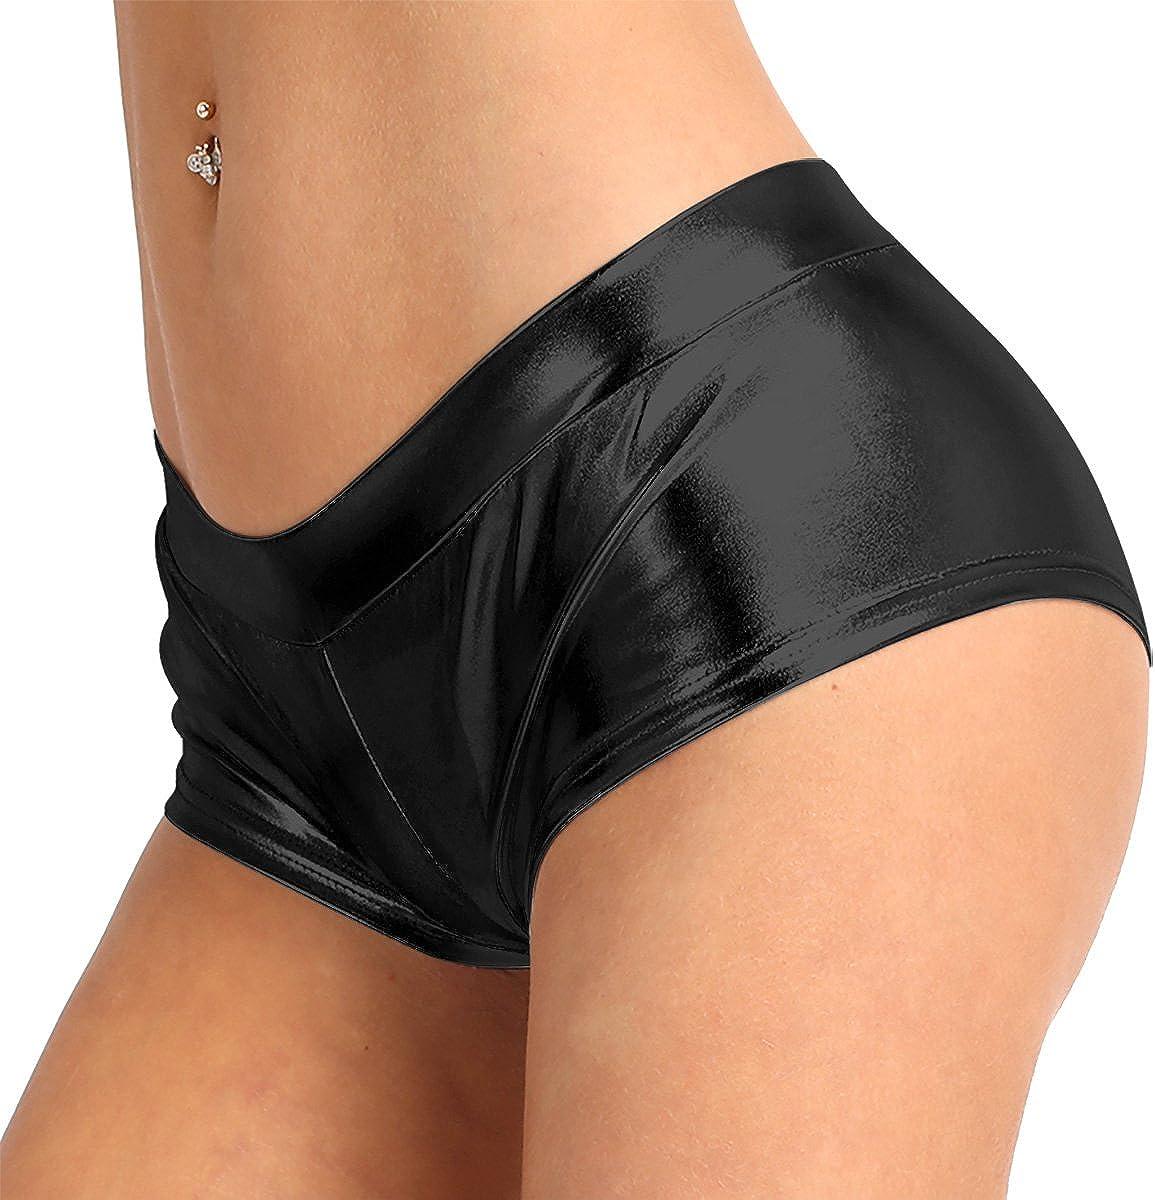 Women Chic Hot Shorts Pants Metallic Leather Shiny Short Pants Slim Hipster HOT